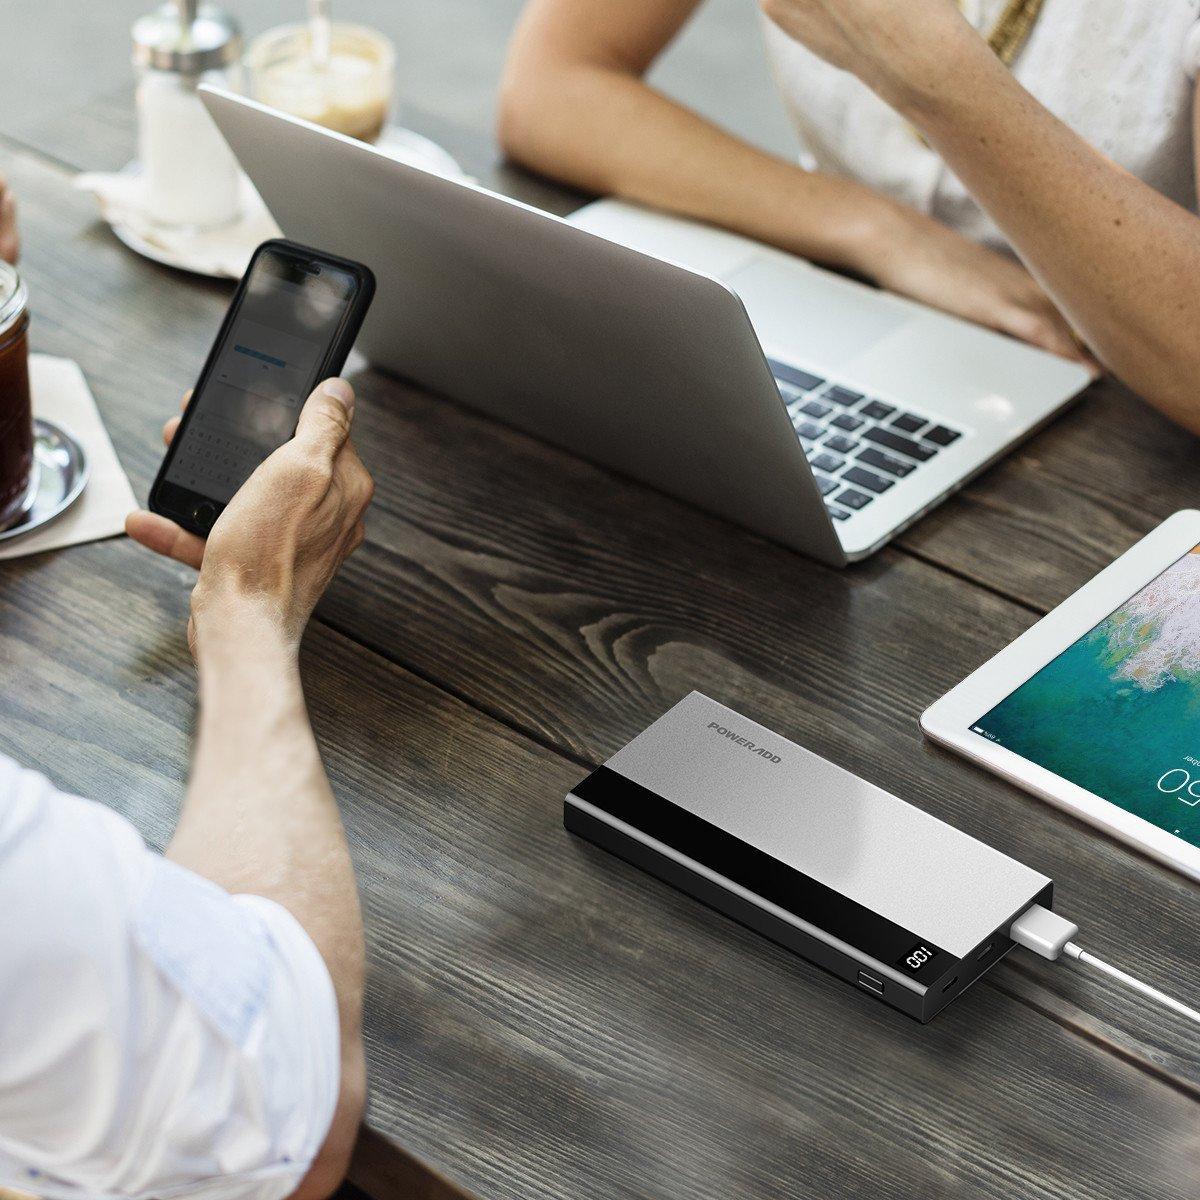 Poweradd 10000 mAh Powerbank Metallische Handy Externe Akkus , LED Bildchirm Bildschirm zeigt die verbleibende Kapazität an, Besitzt Micro USB Input, USB Output, Ein Input/Output USB C Port